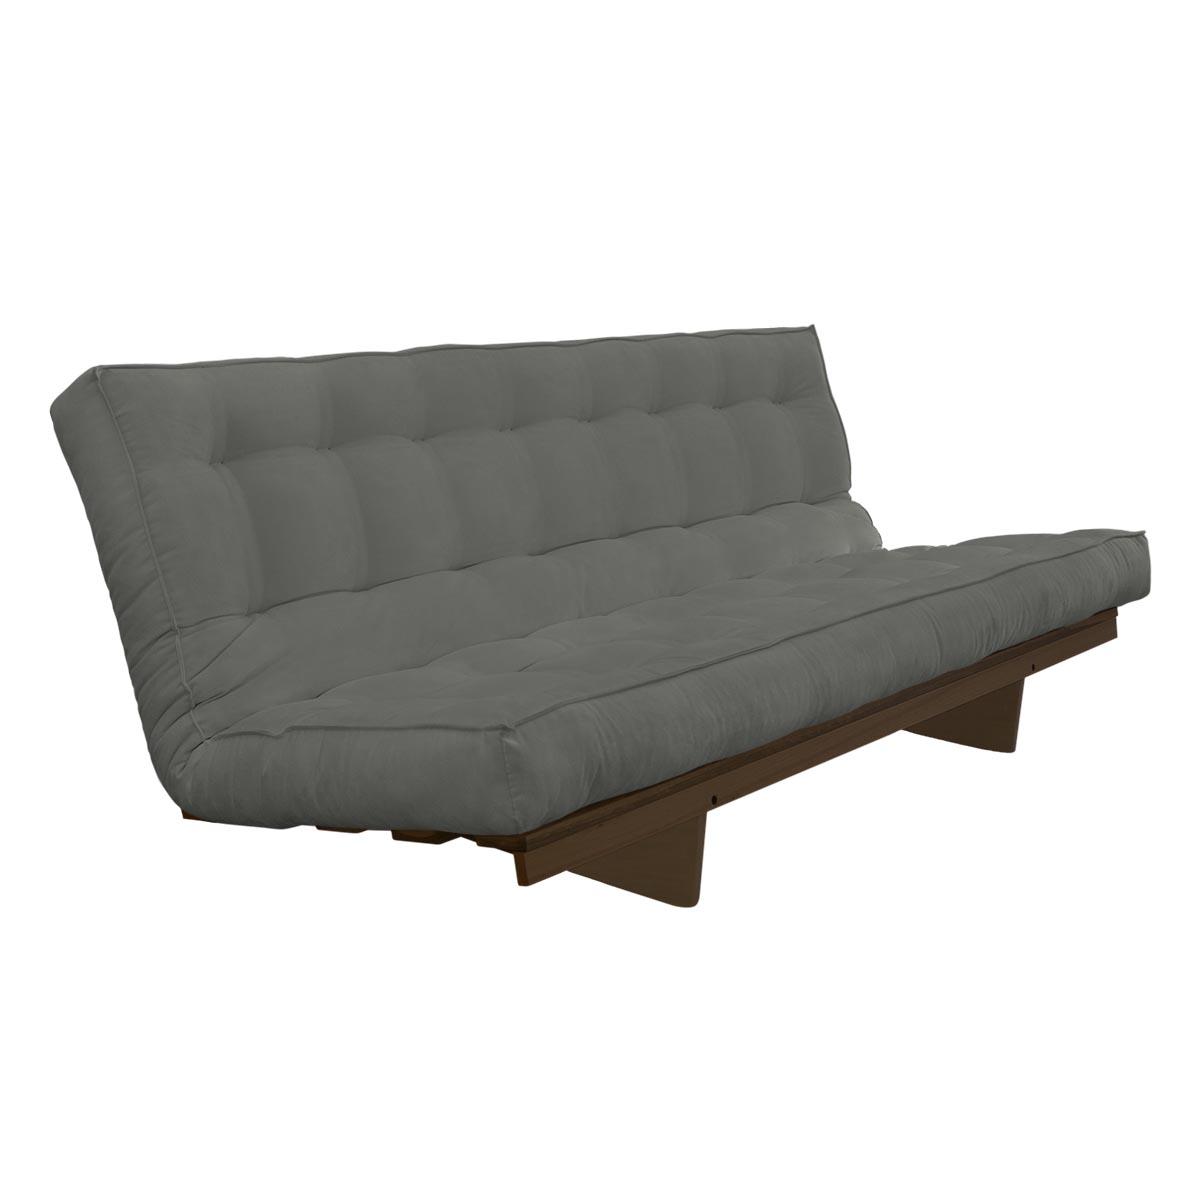 Sofa-cama-CHELSEA-180-Sharp-Tecido-Suede-Chamois-